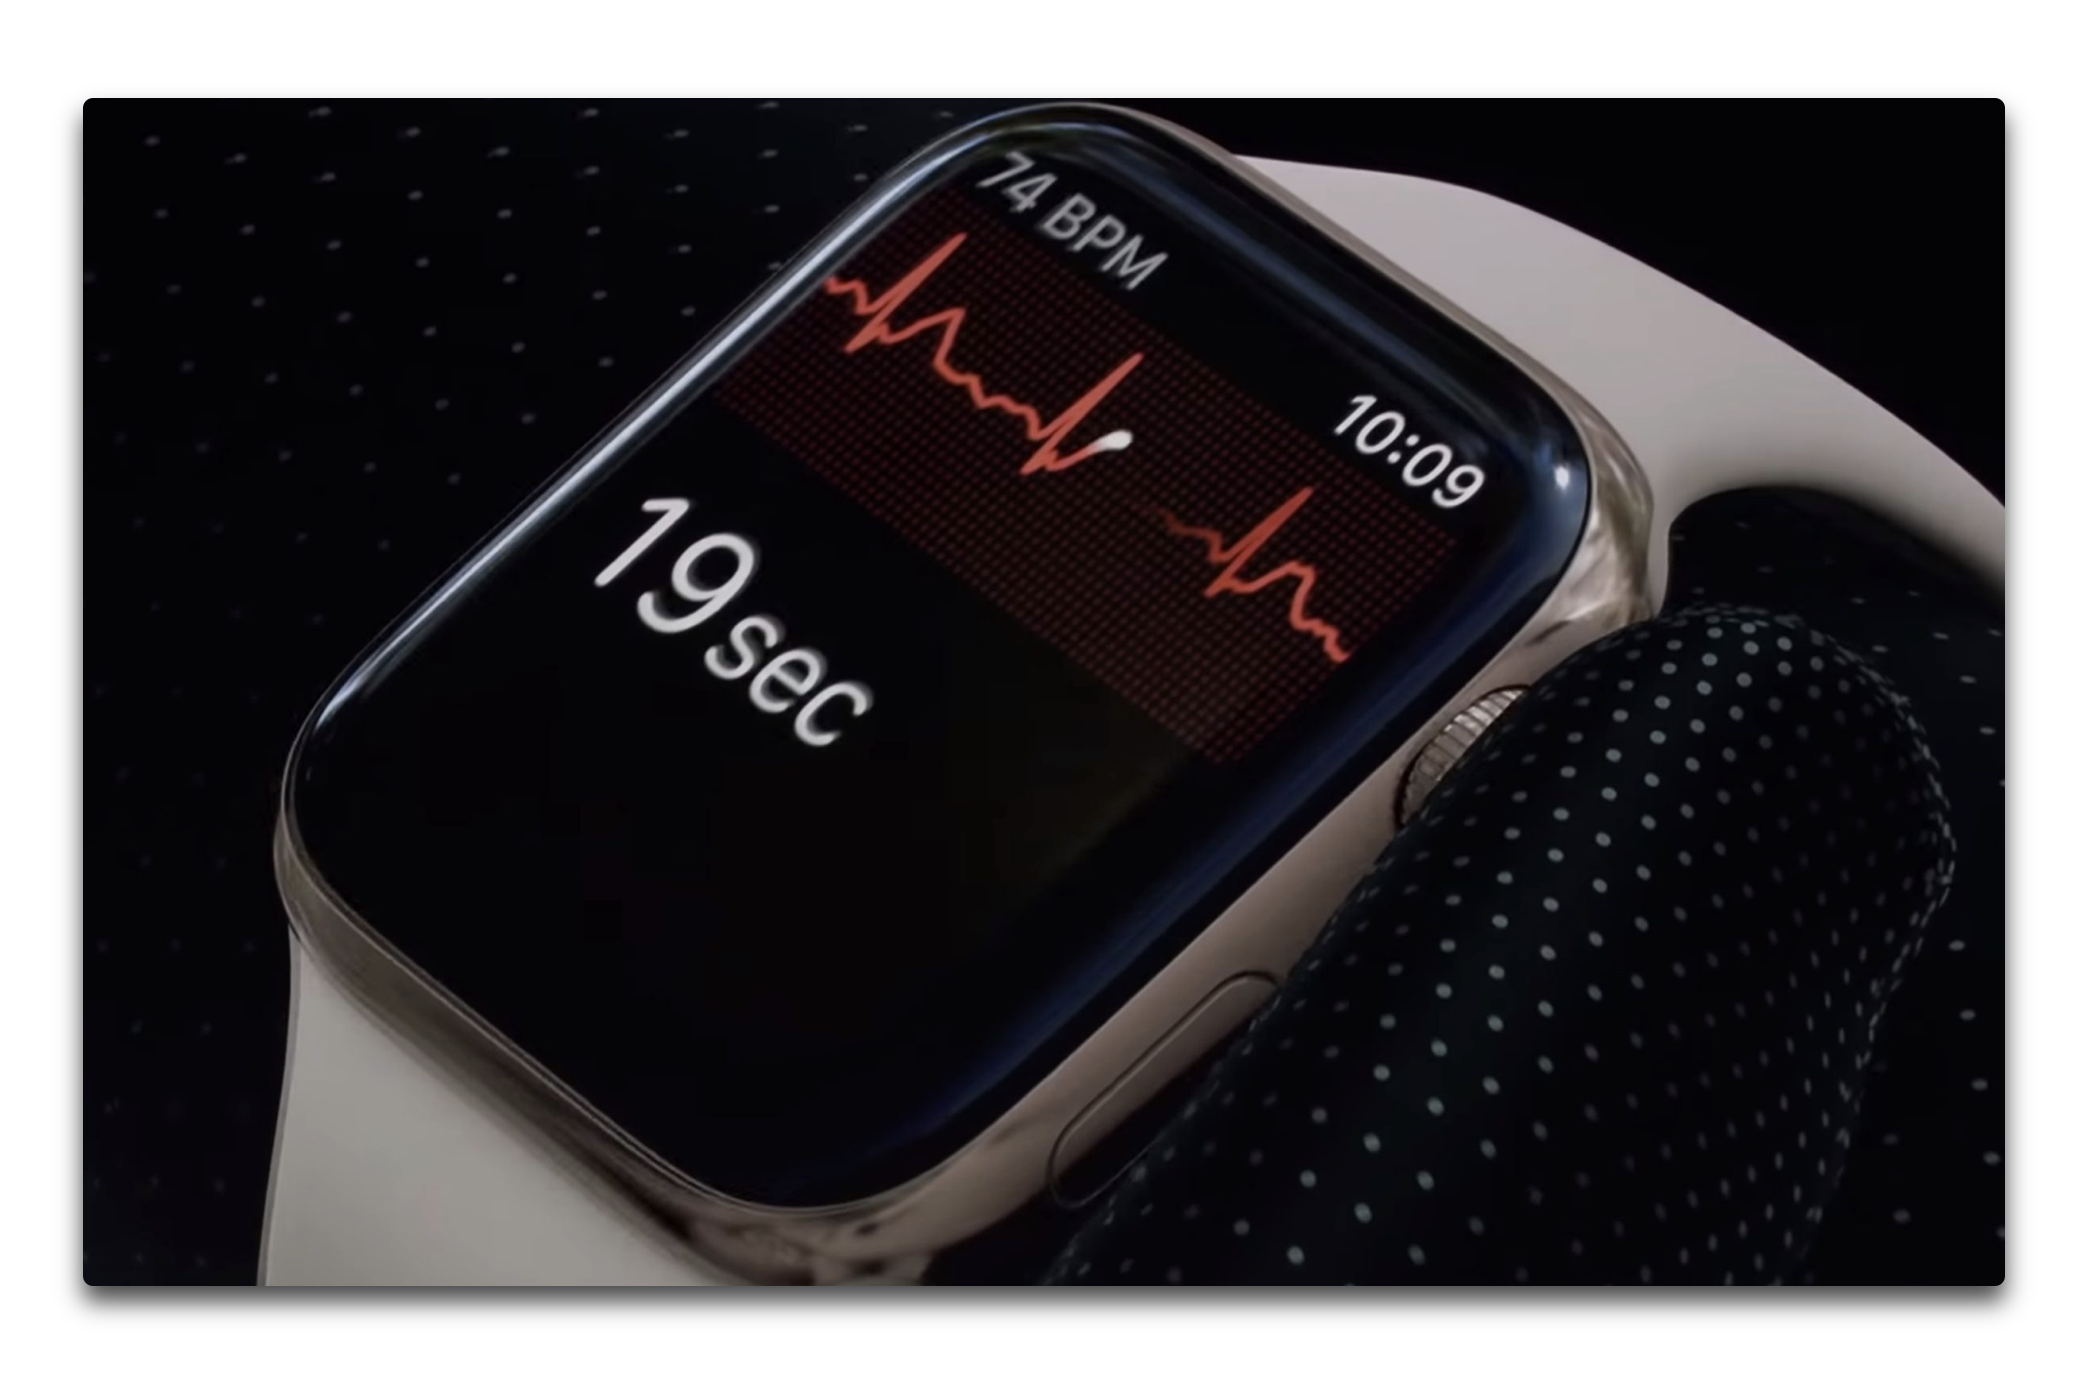 Tim Cook、Appleが予防医療技術に取り組んでいることを示唆